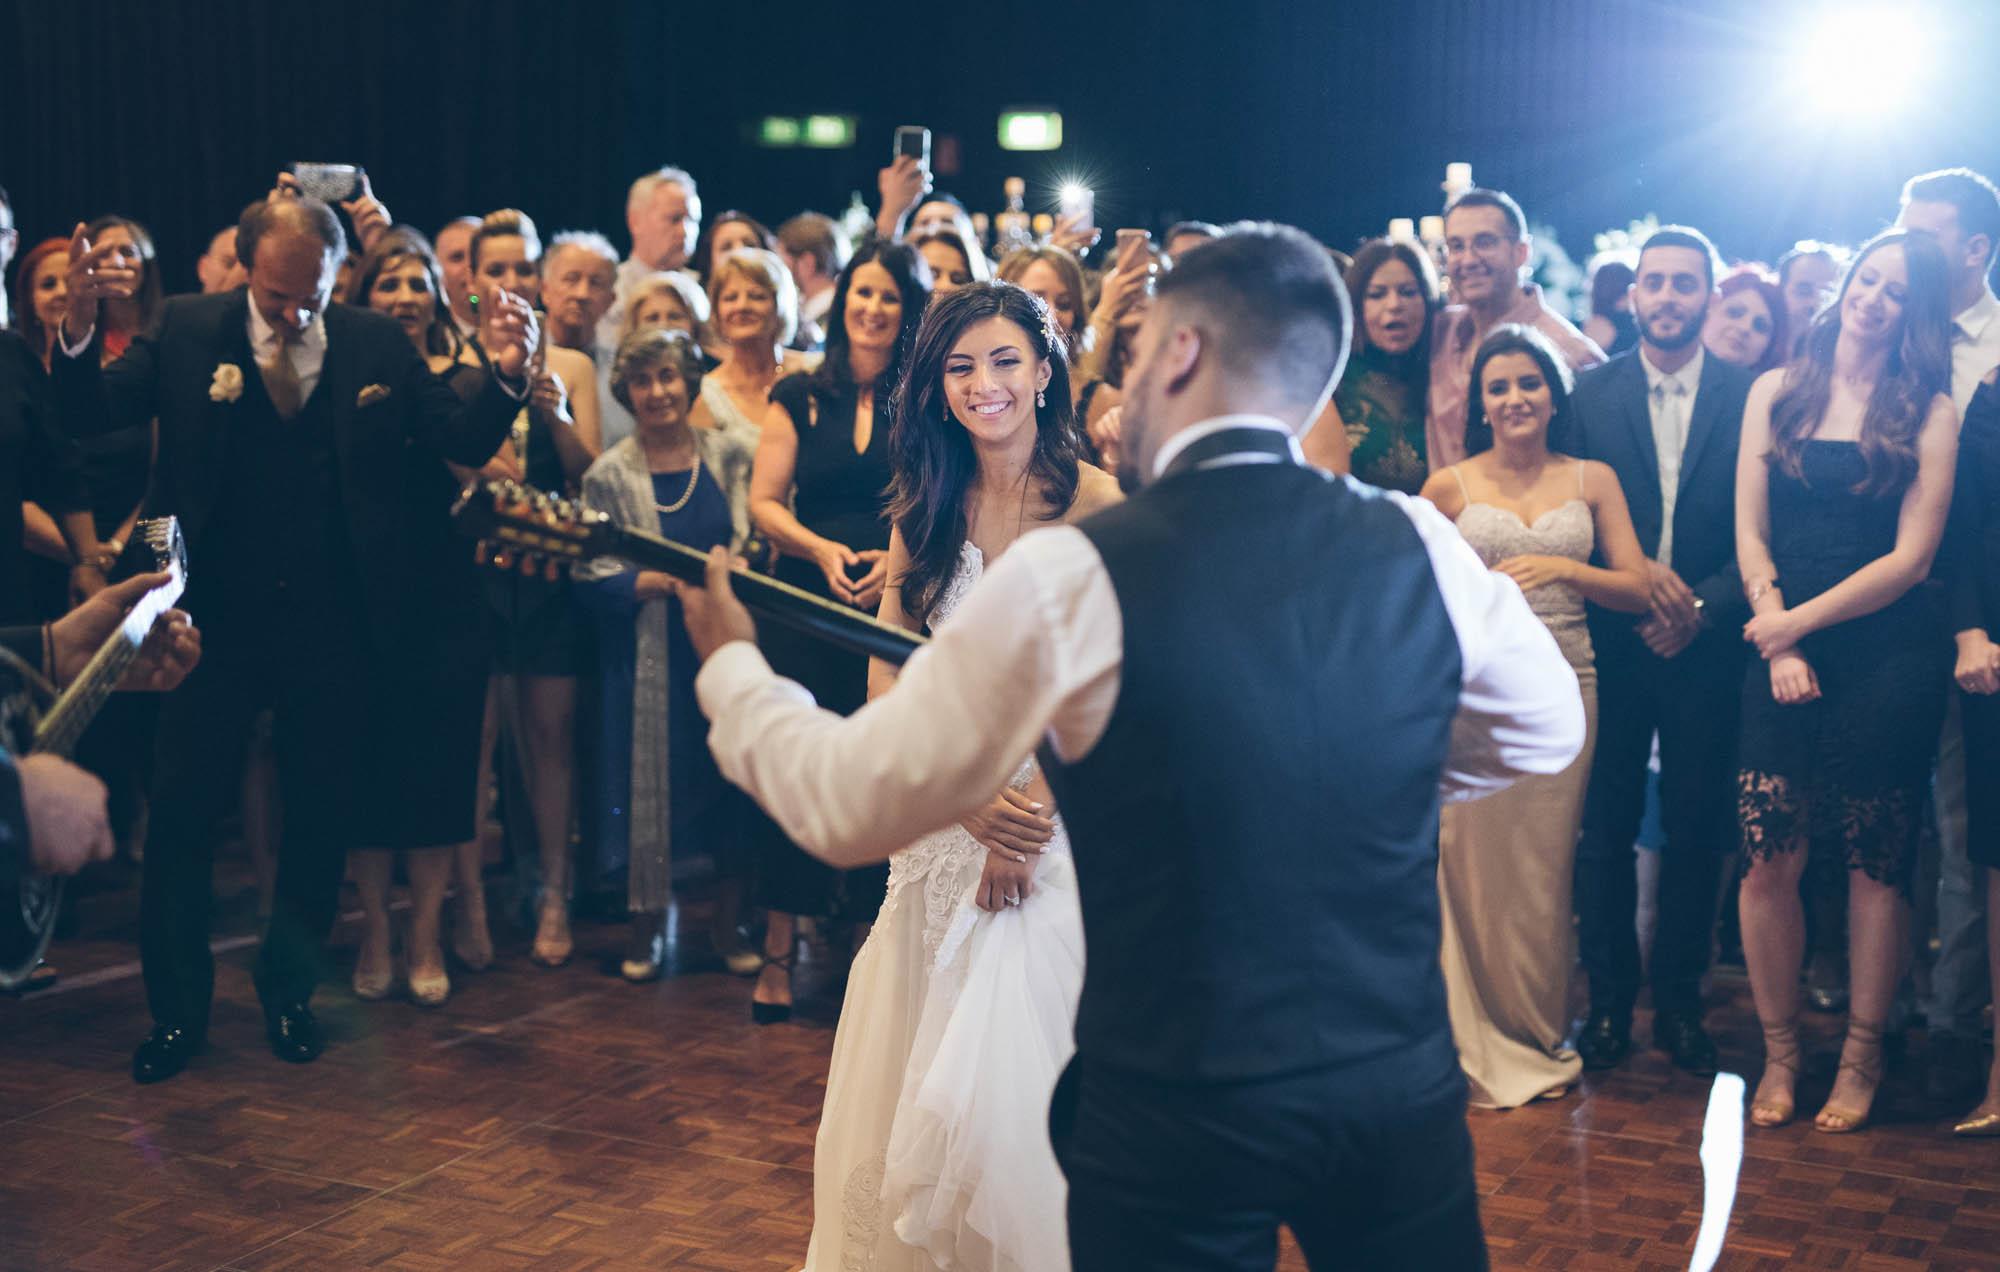 MacDougall-Photography-Sydney-Wedding-Photographers-79.jpg